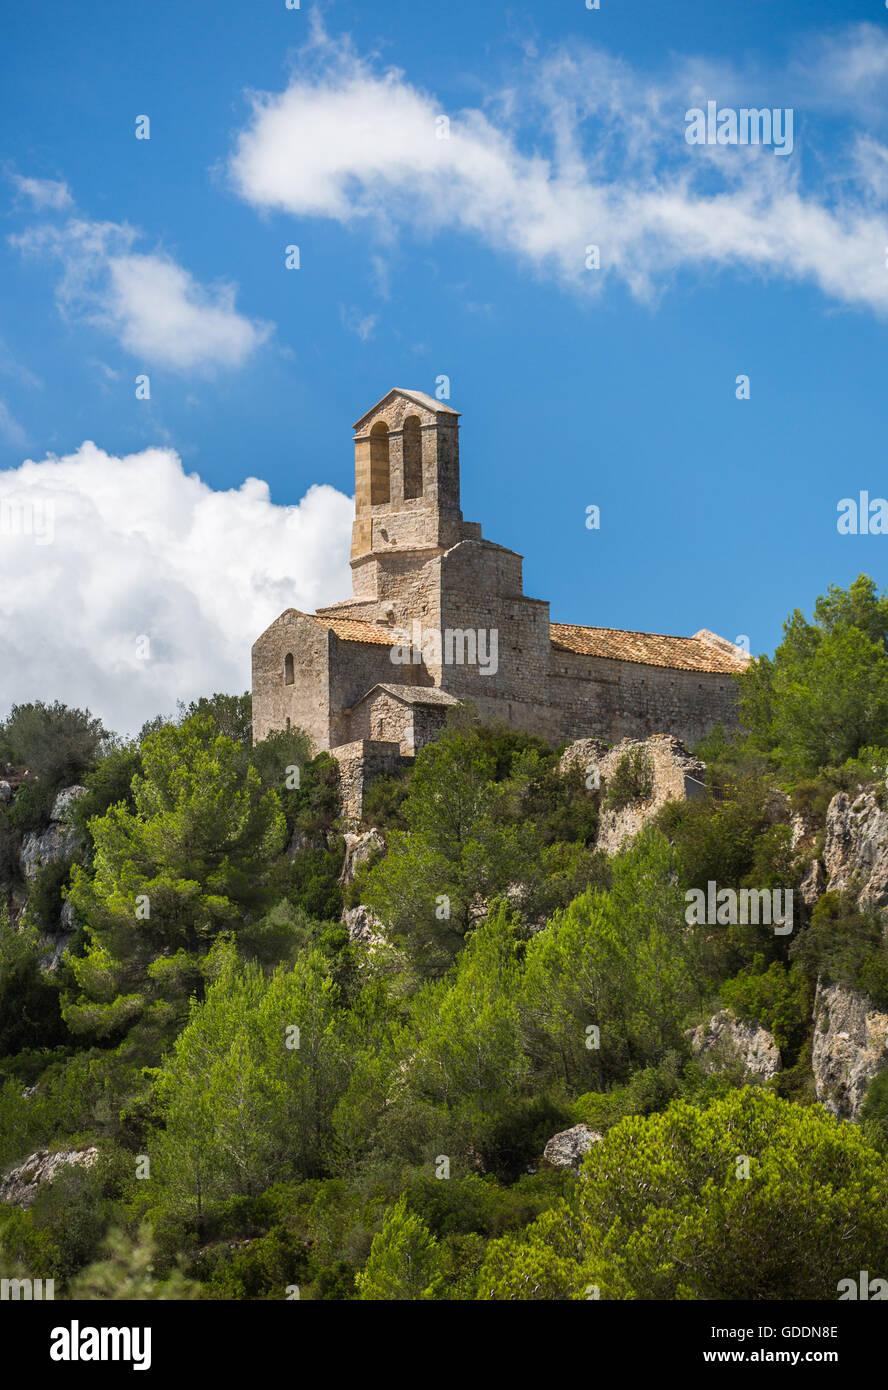 Spain,Catalonia,Barcelona province,San Miguel Church,Olerdola Castle - Stock Image